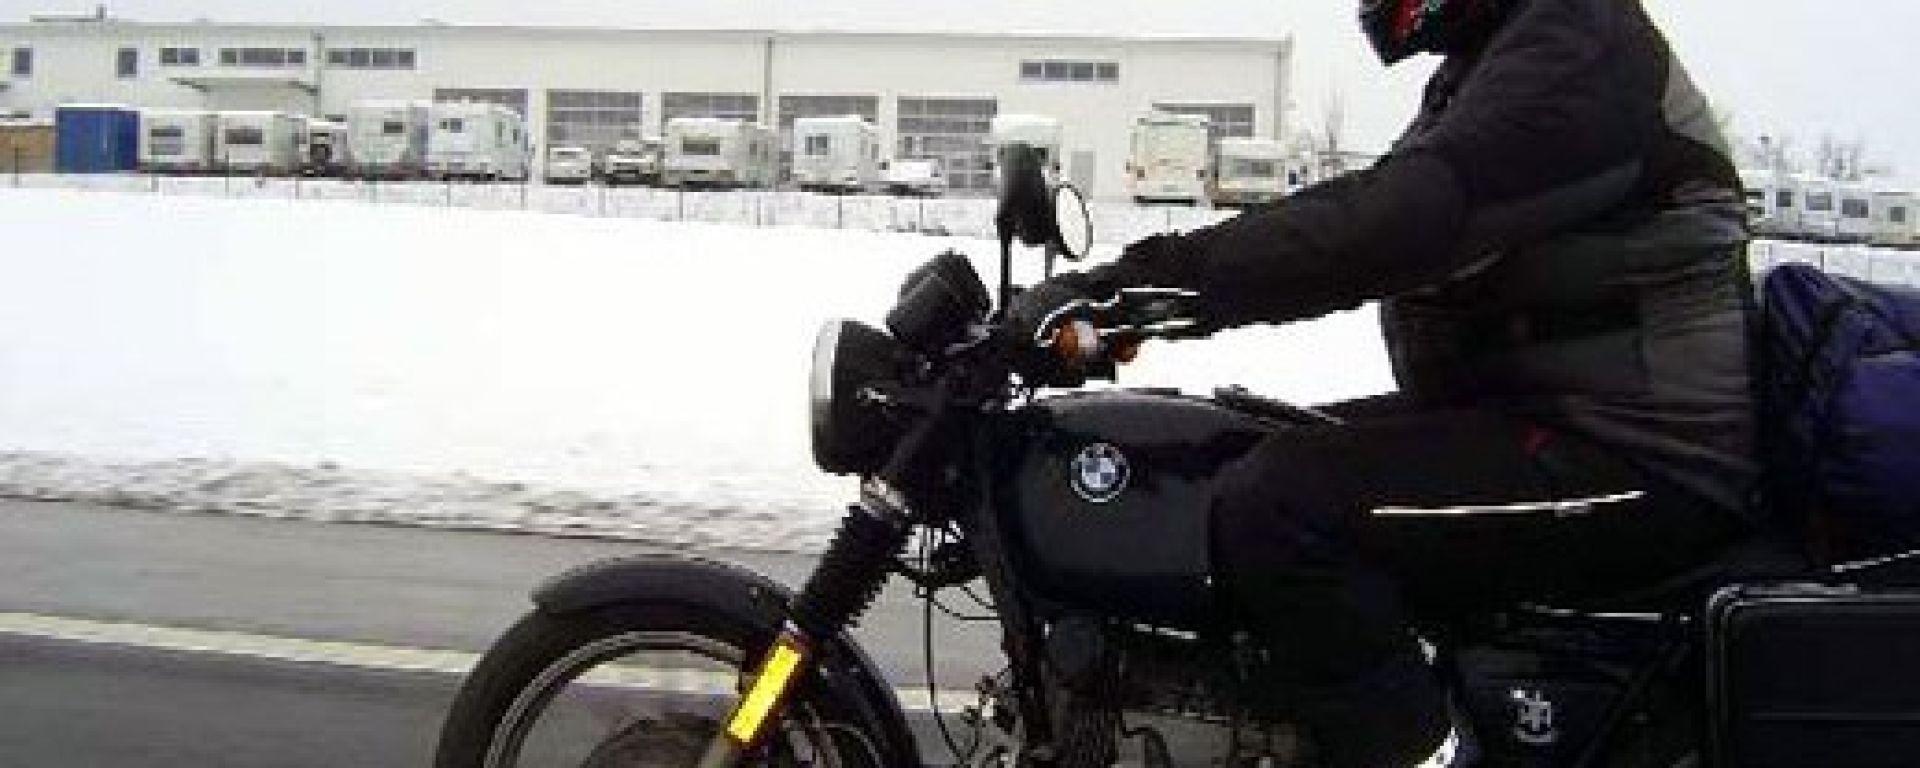 Inverno in moto: guidare al freddo